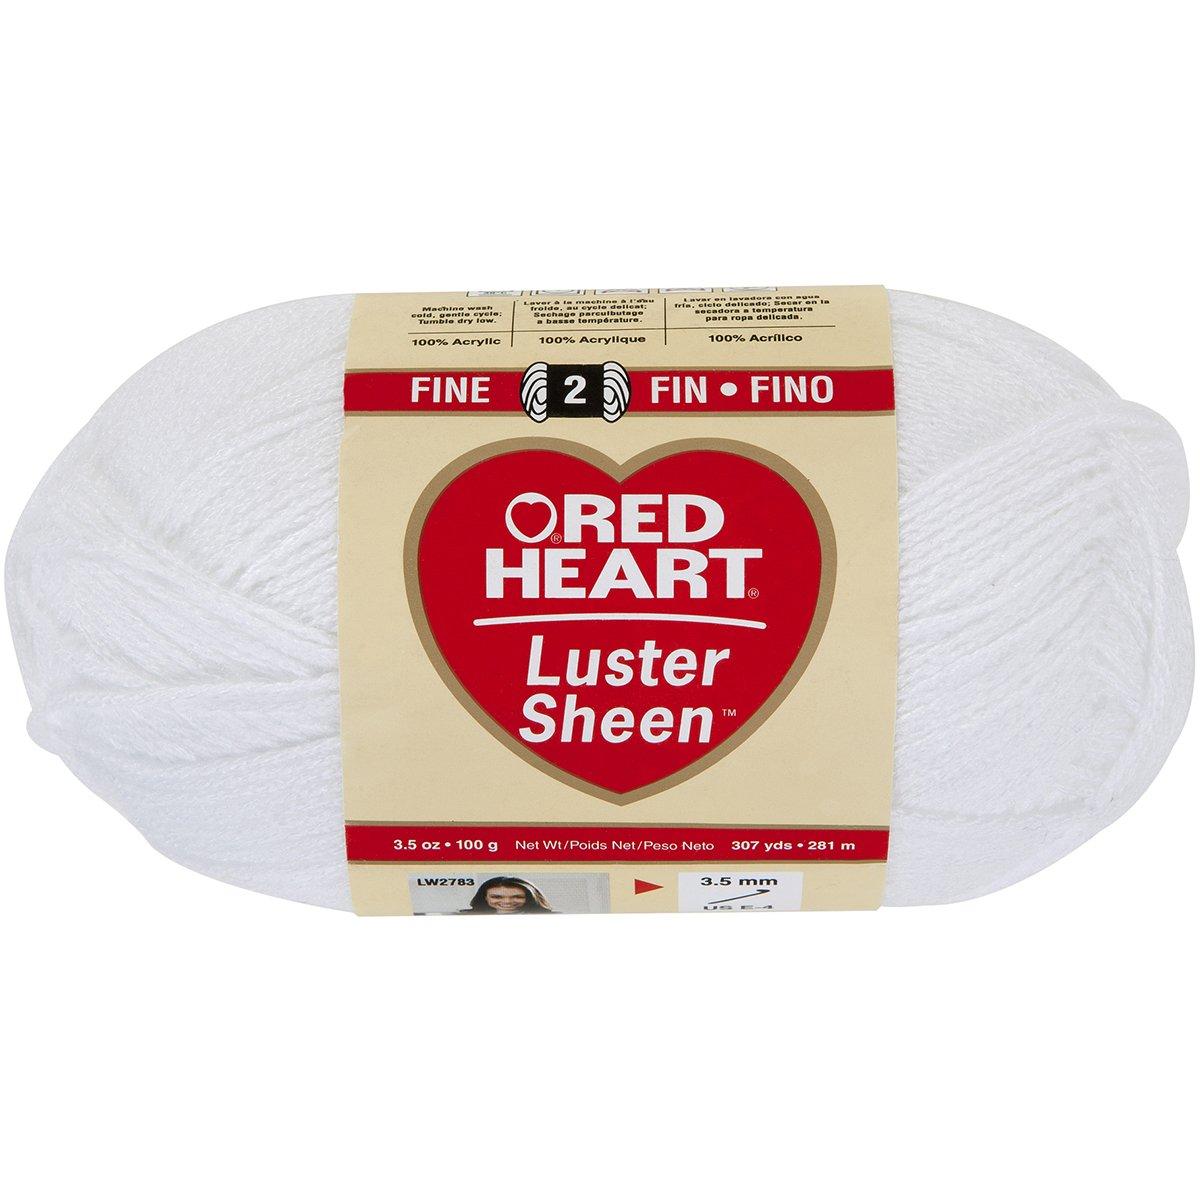 Coats Yarn E794-1 116073 Red Heart Luster Sheen Yarn White